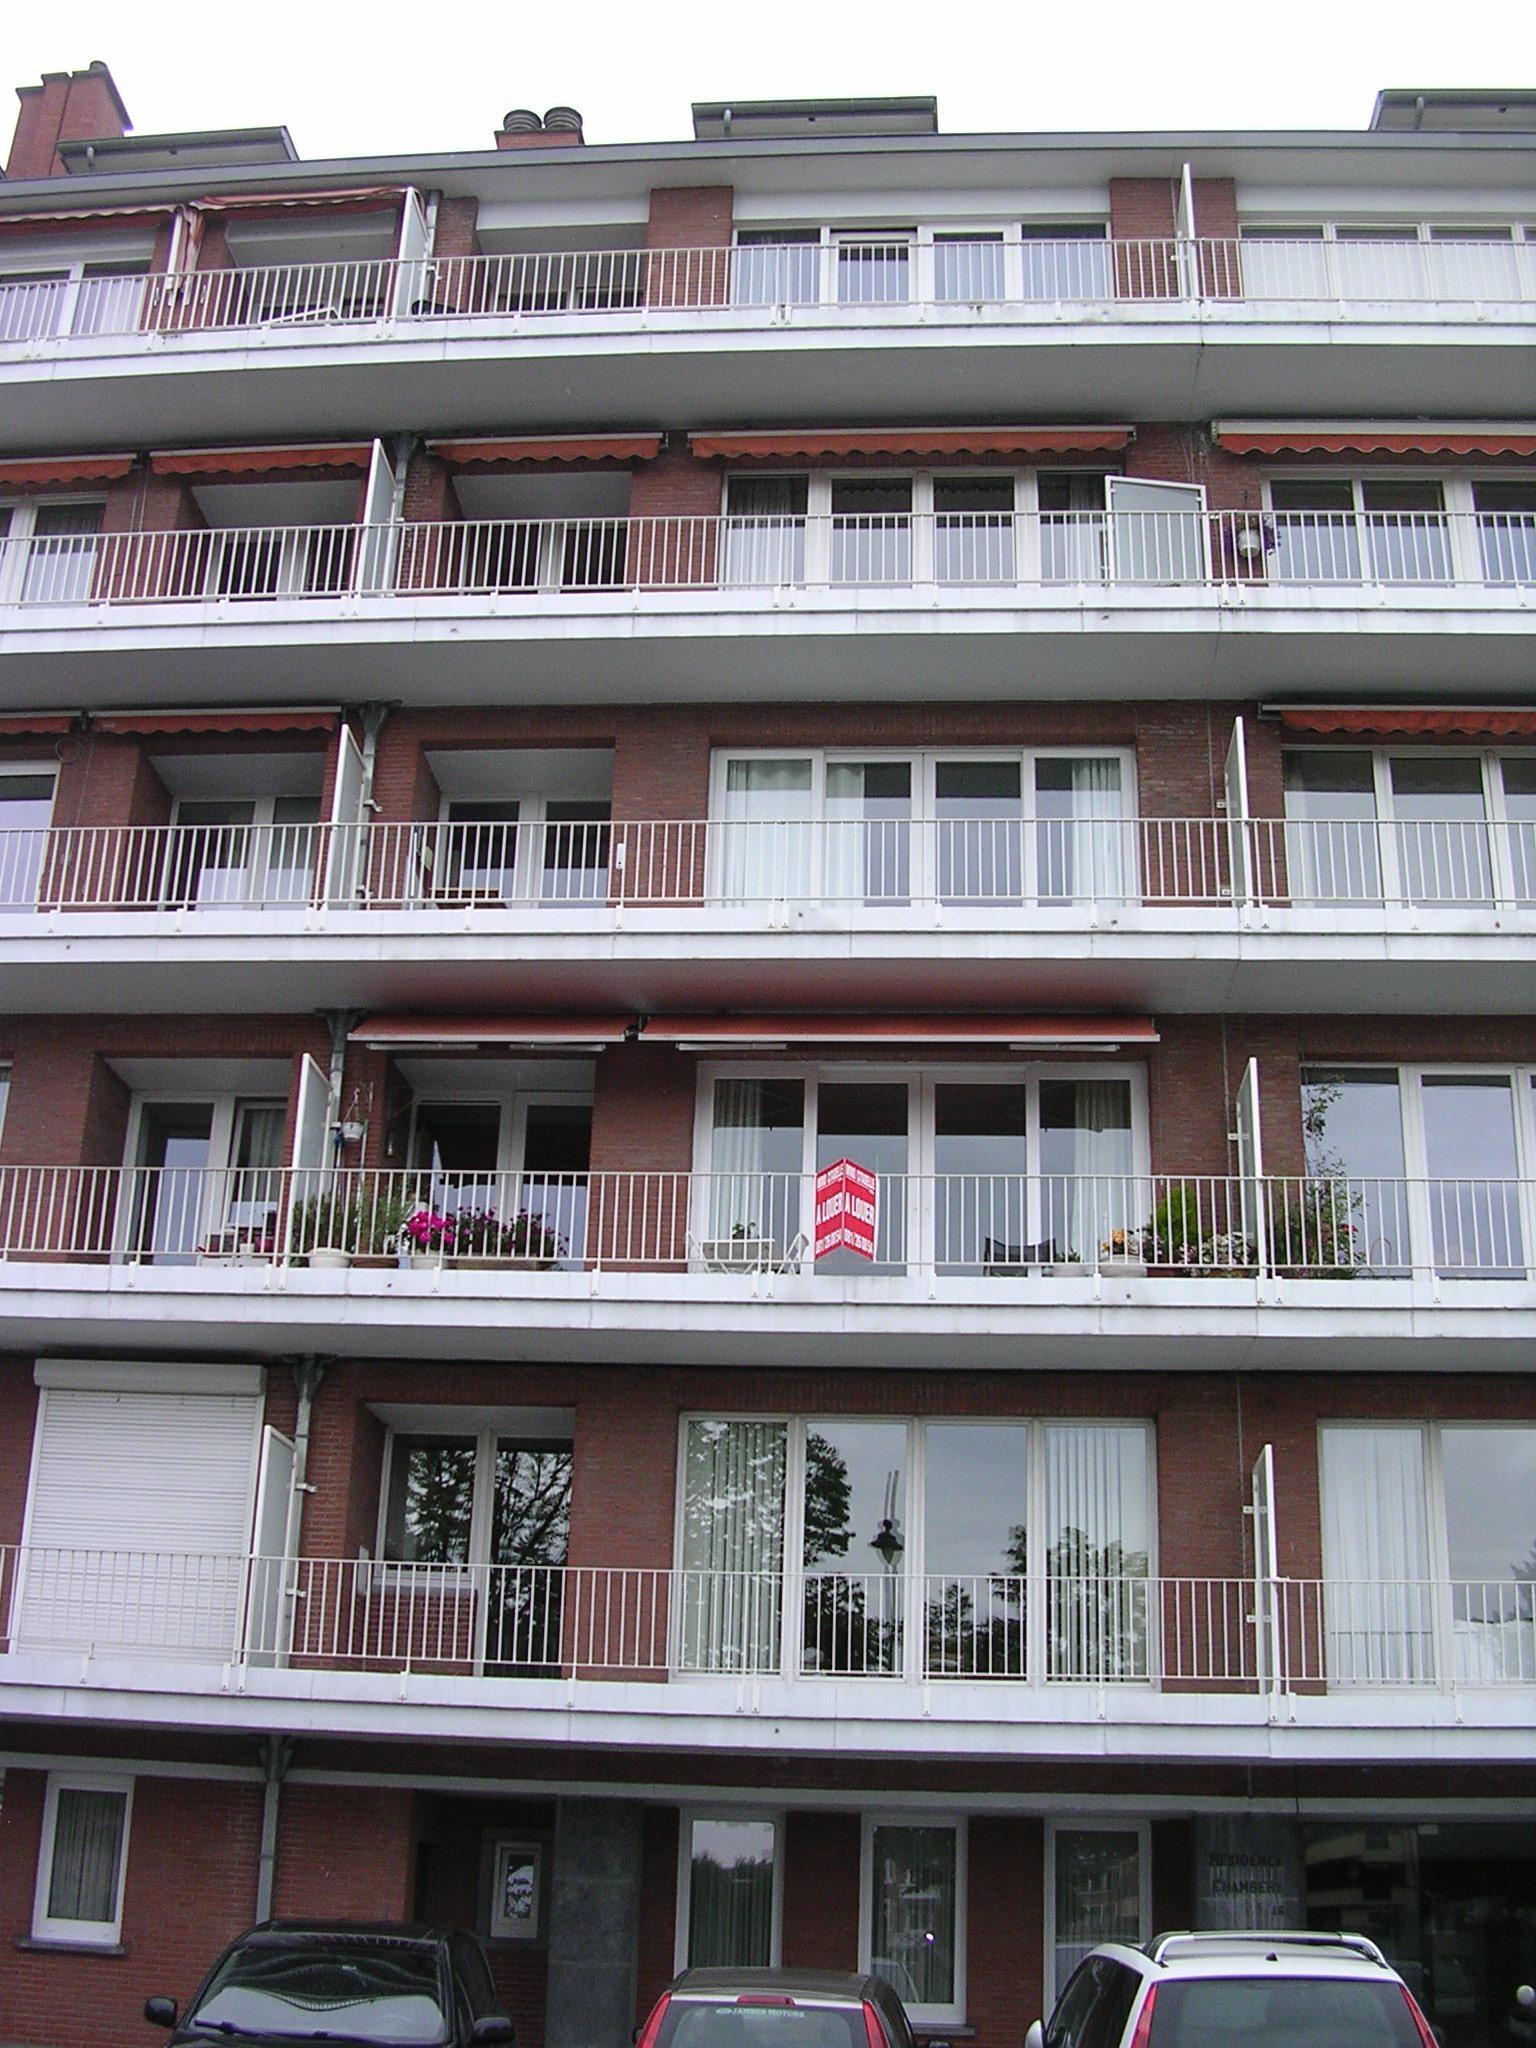 Maison louer namur 3 chambres ventana blog for Garage a louer 2ememain